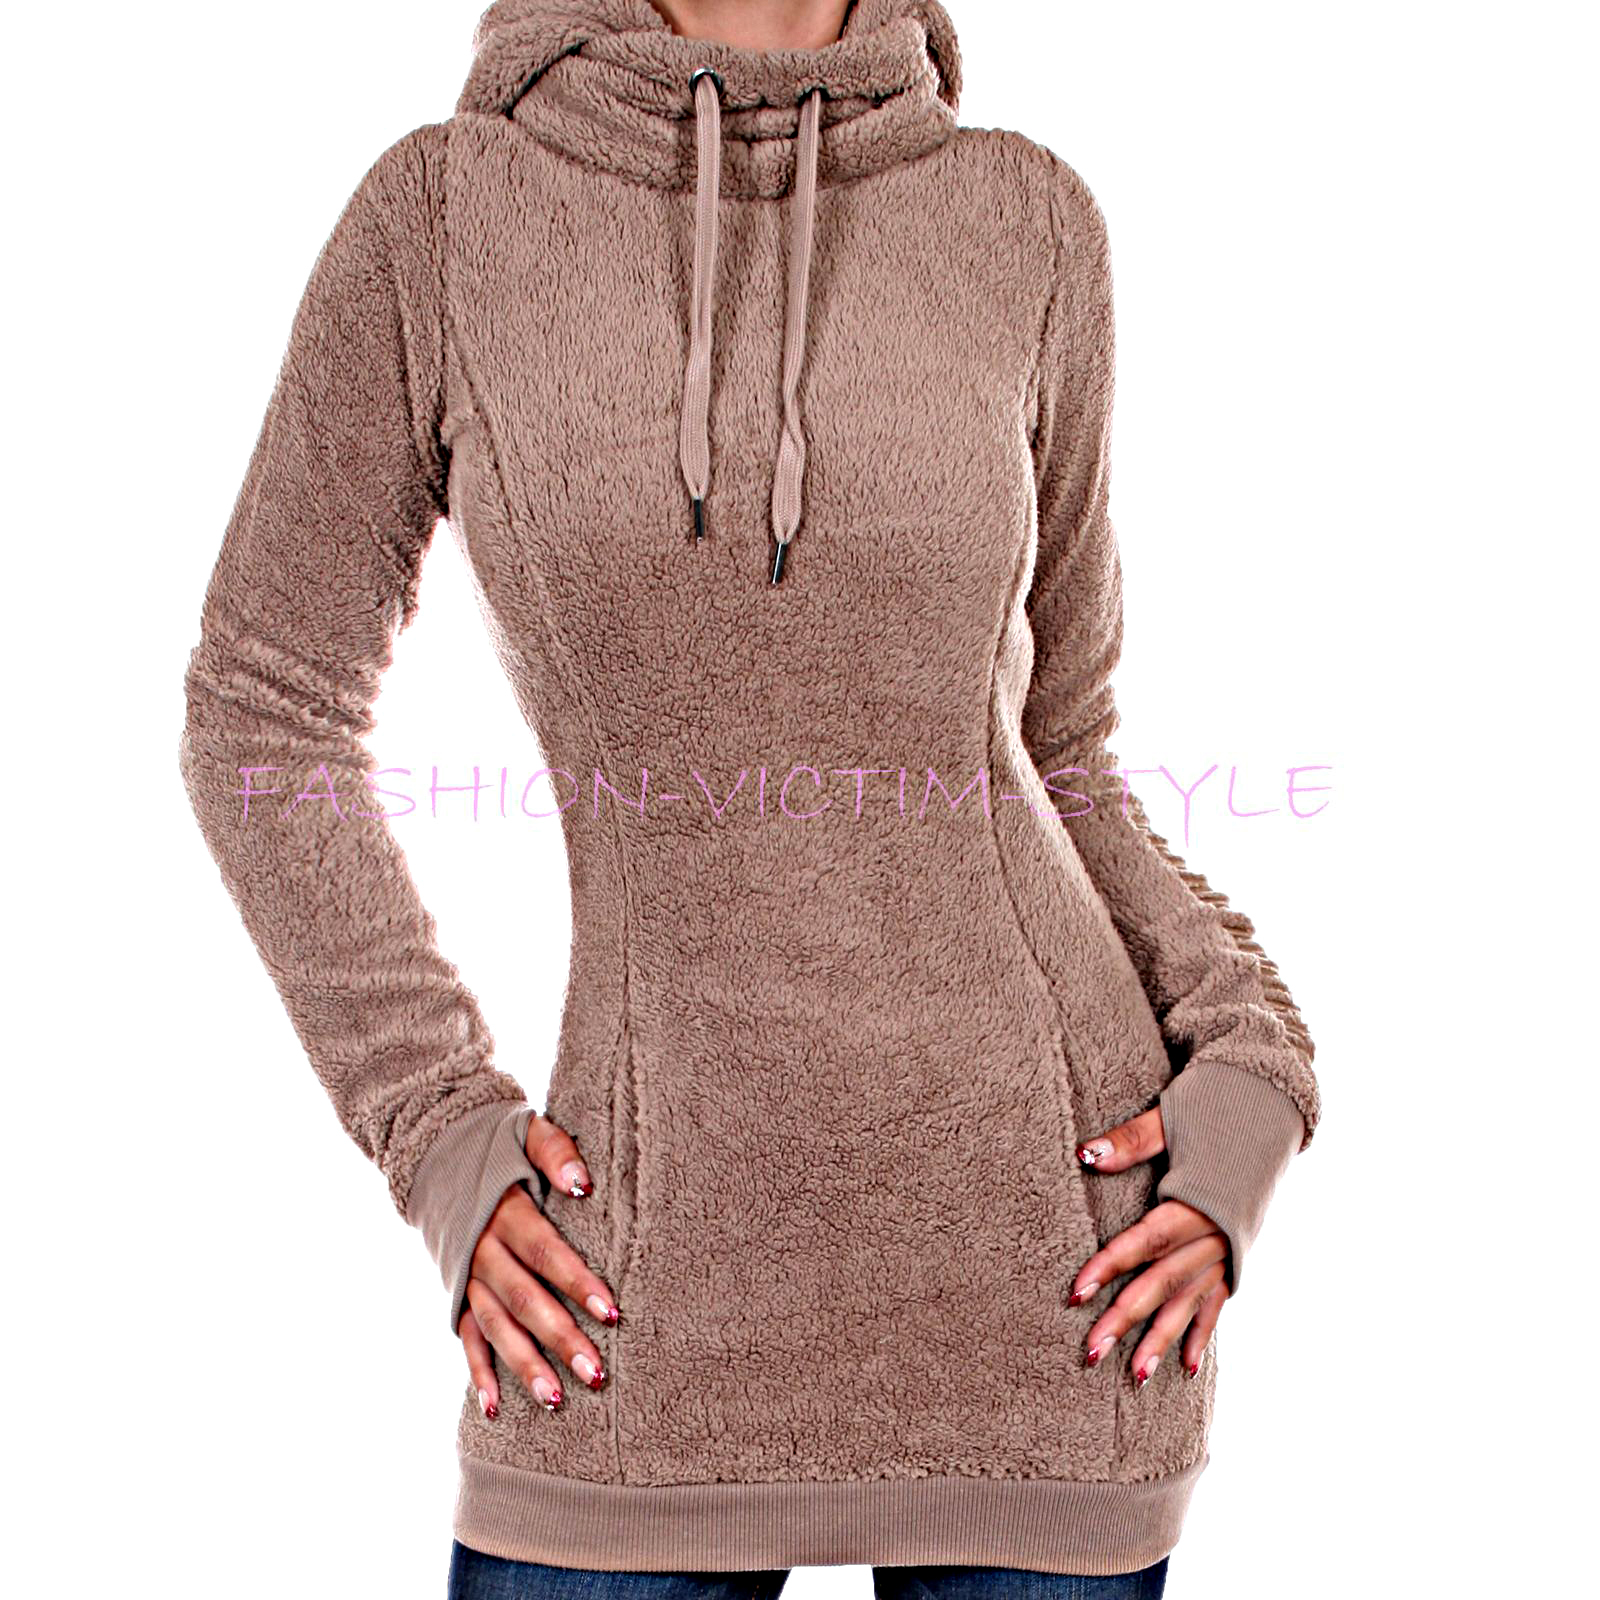 http://fashion-victim-style.com/Ebay/28.08.11/TFP4.jpg